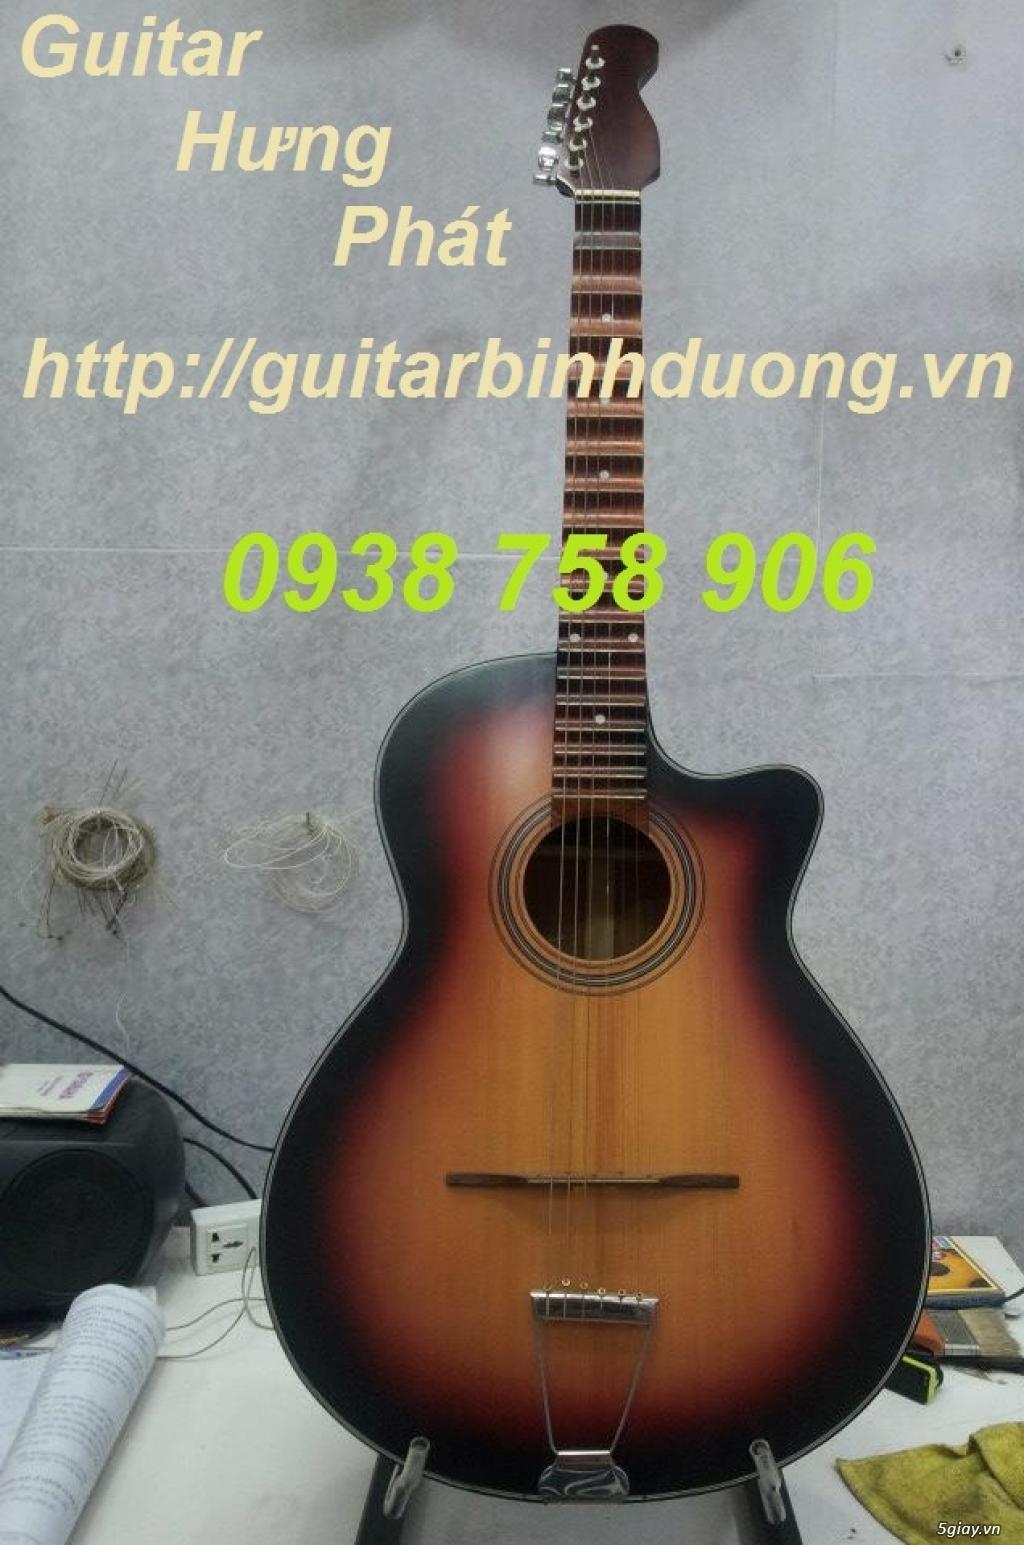 Đàn guitar phím lõm giá rẻ GUITAR HƯNG PHÁT - 5